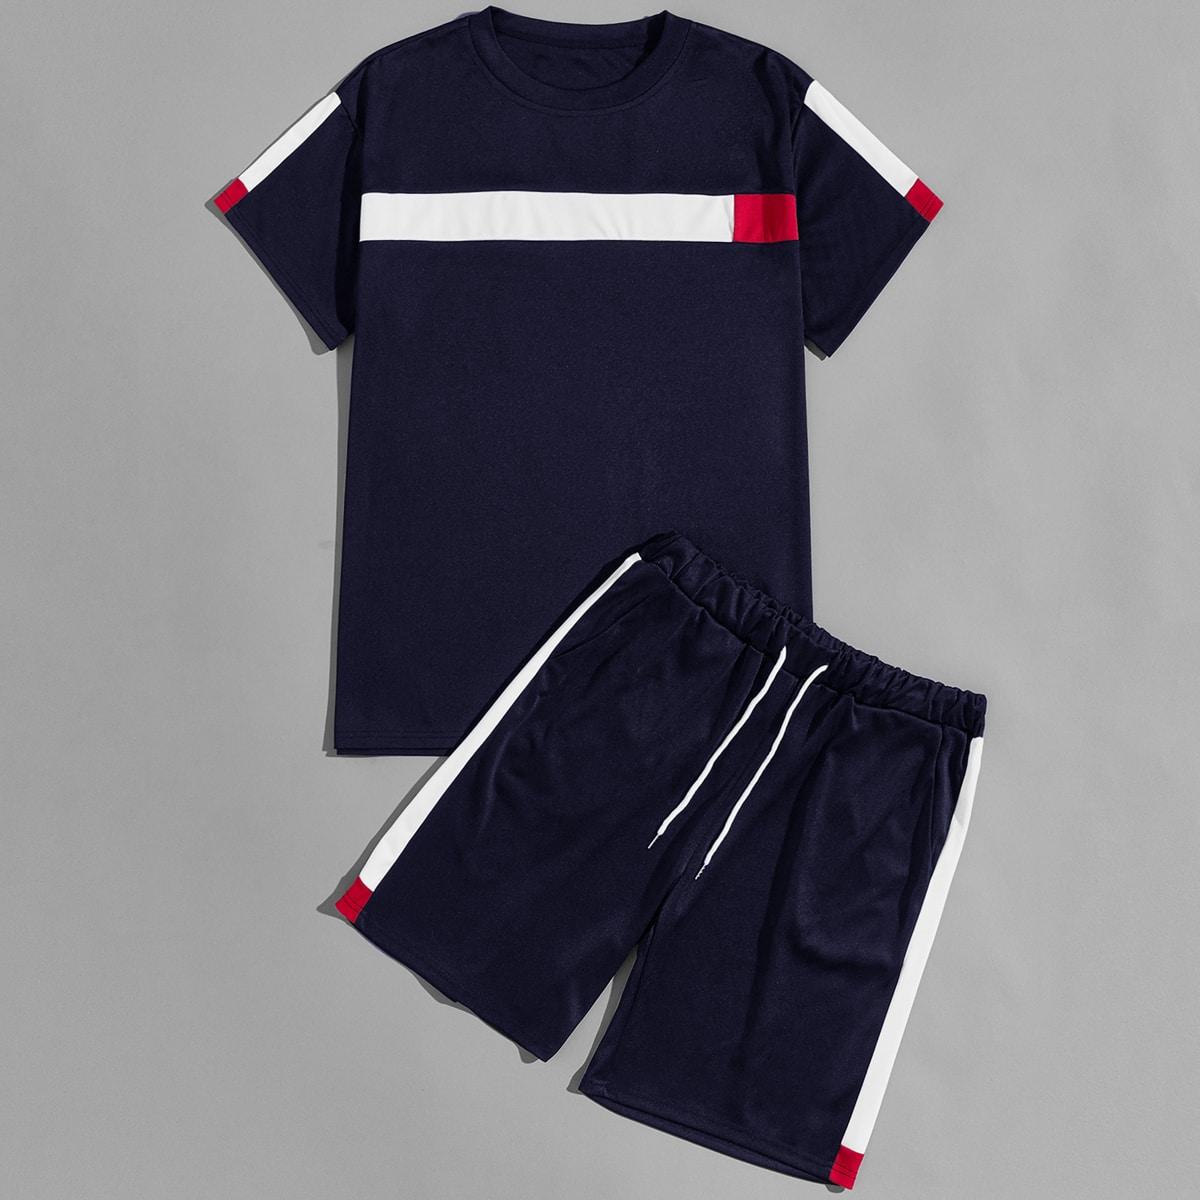 Мужская контрастная футболка и шорты на кулиске от SHEIN